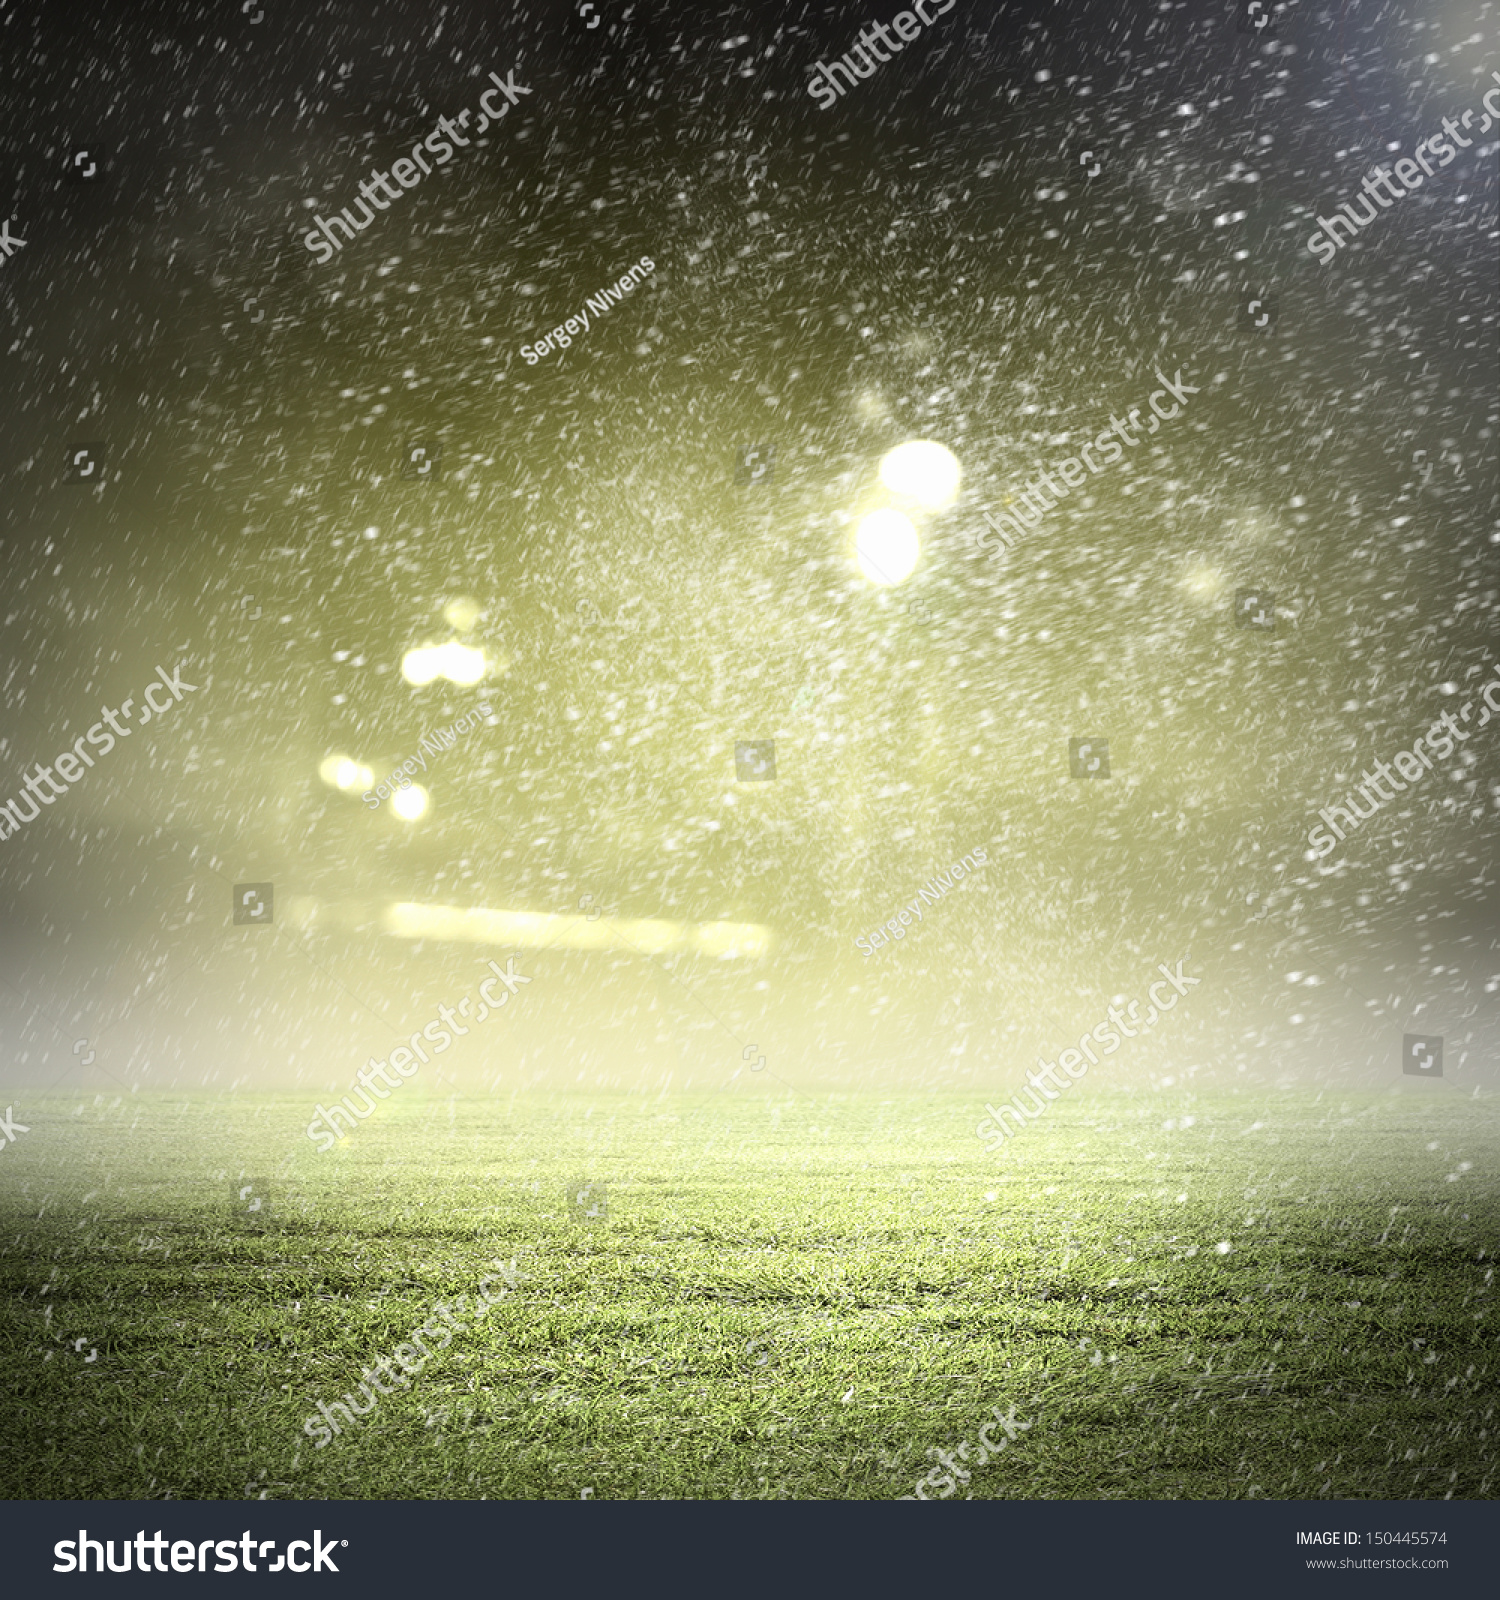 Stadium In Lights And Flashes: Image Of Stadium In Lights And Flashes Stock Photo